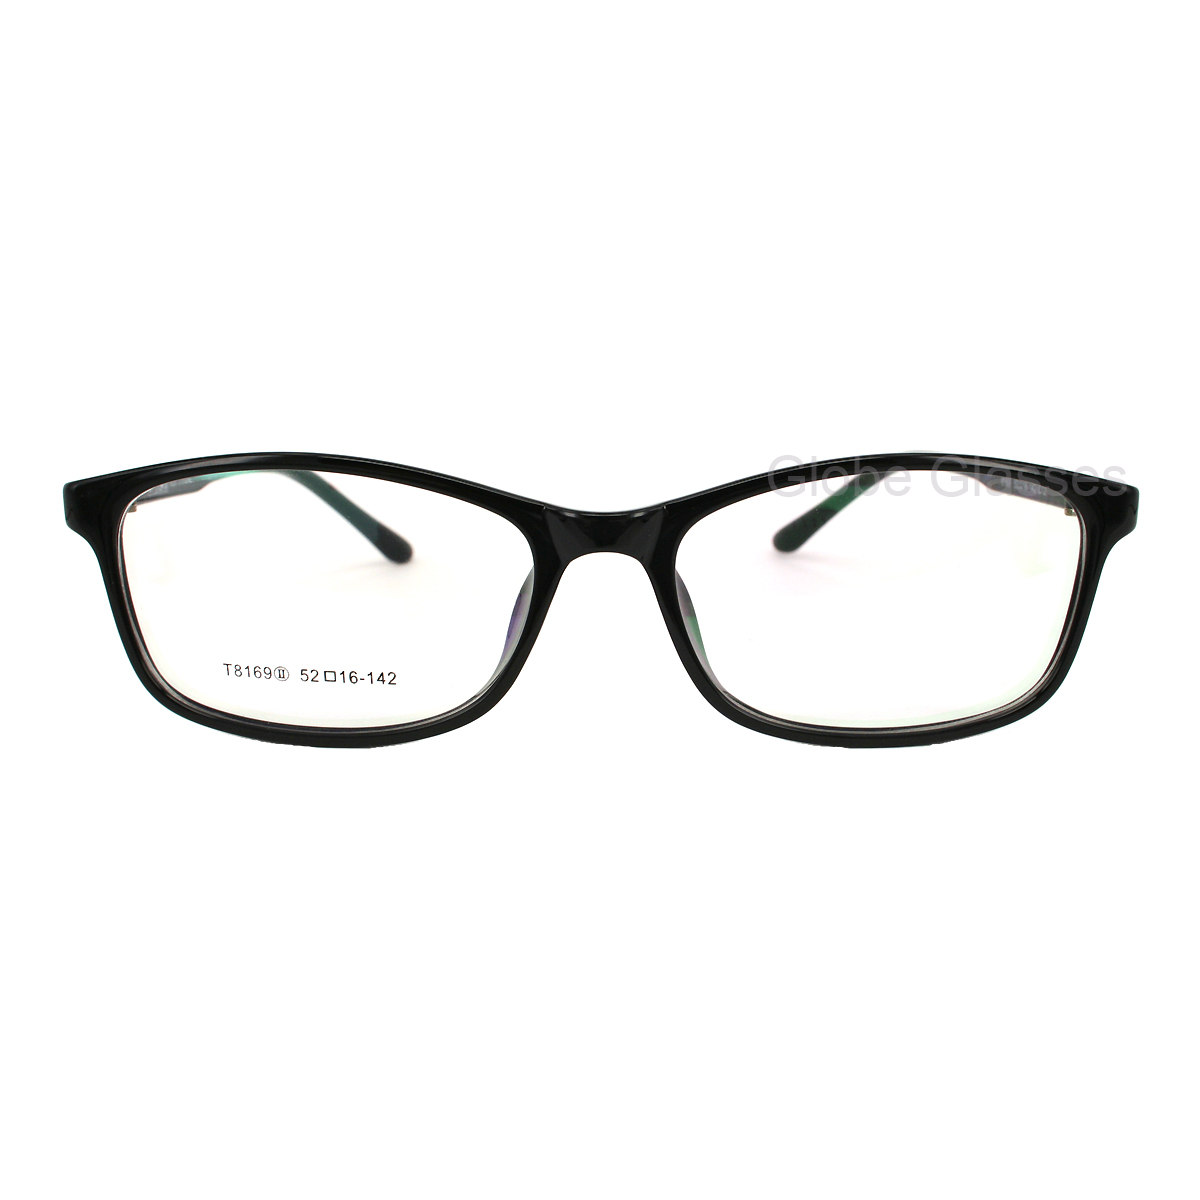 Retro Tr90 Fashion Eyeglasses Frames Vintage Eyewear Clean Lens RX ...